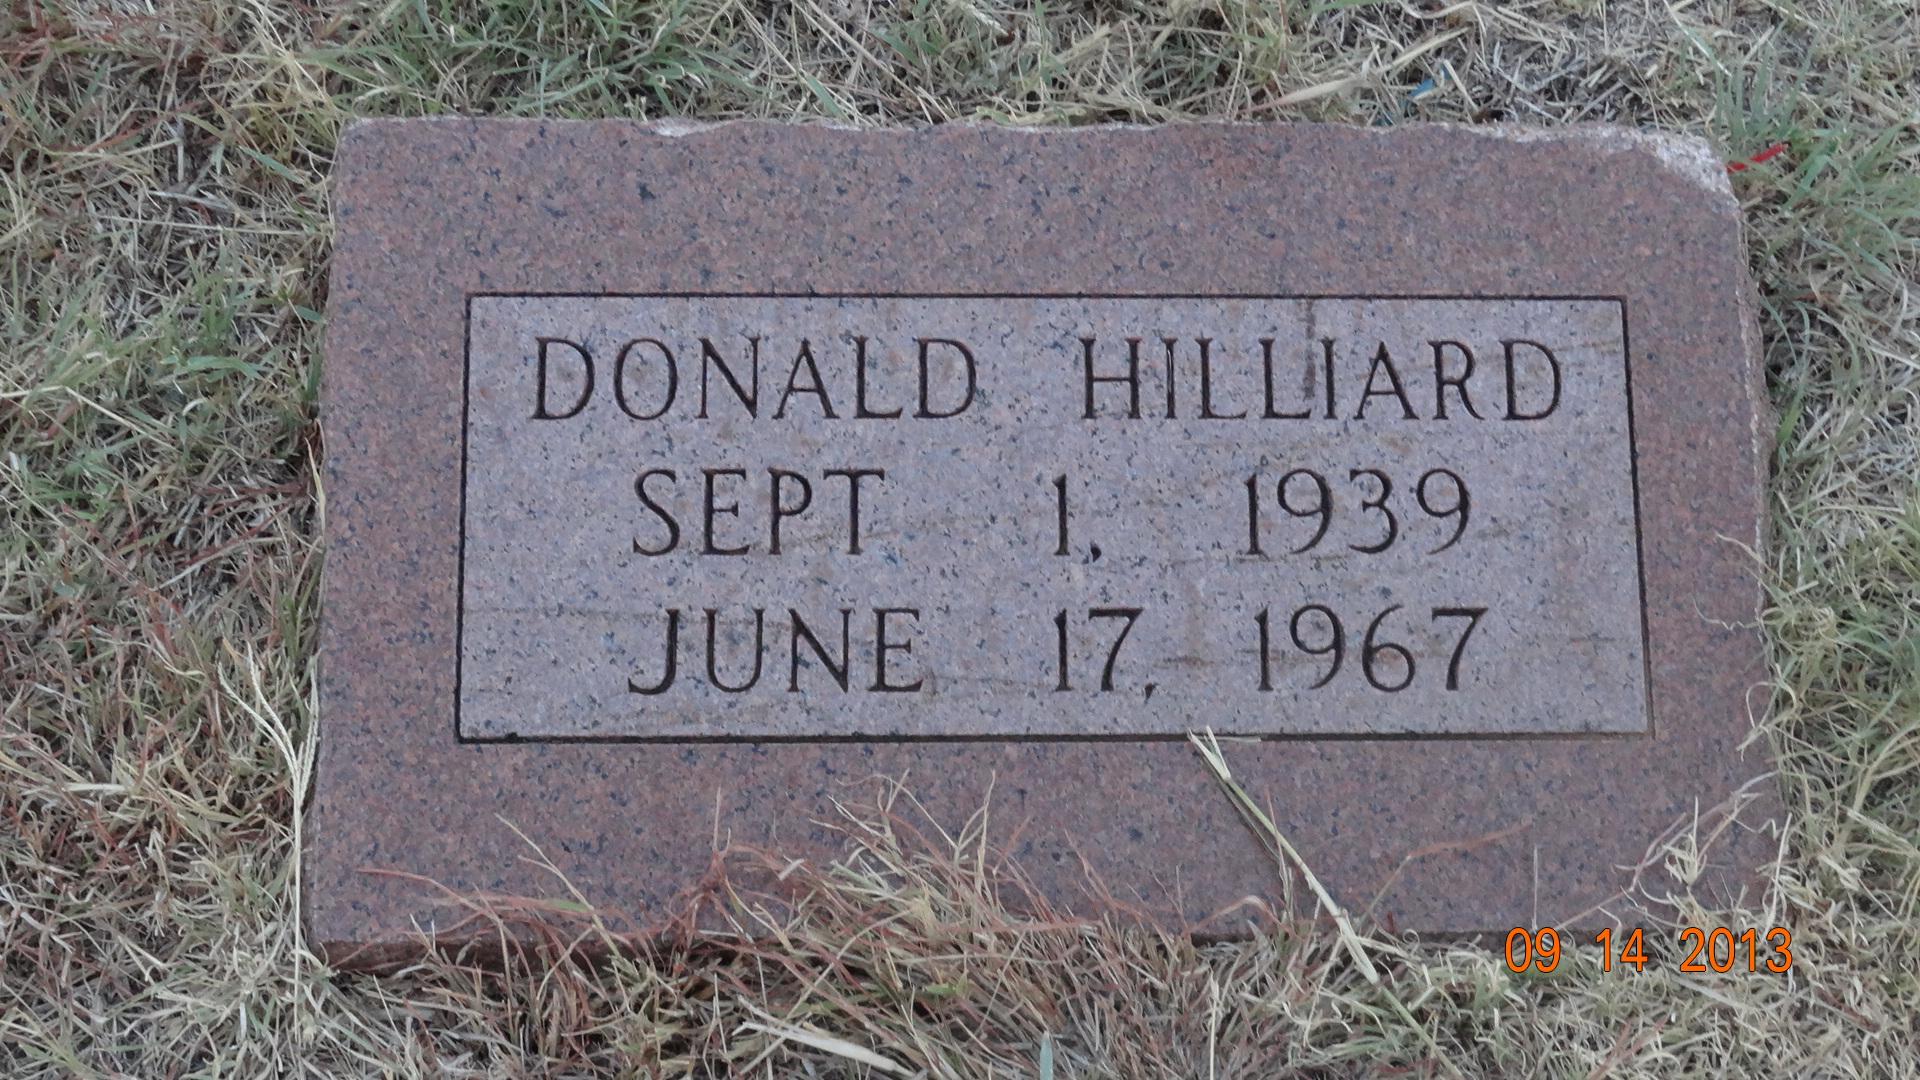 Donald Edgar Hilliard